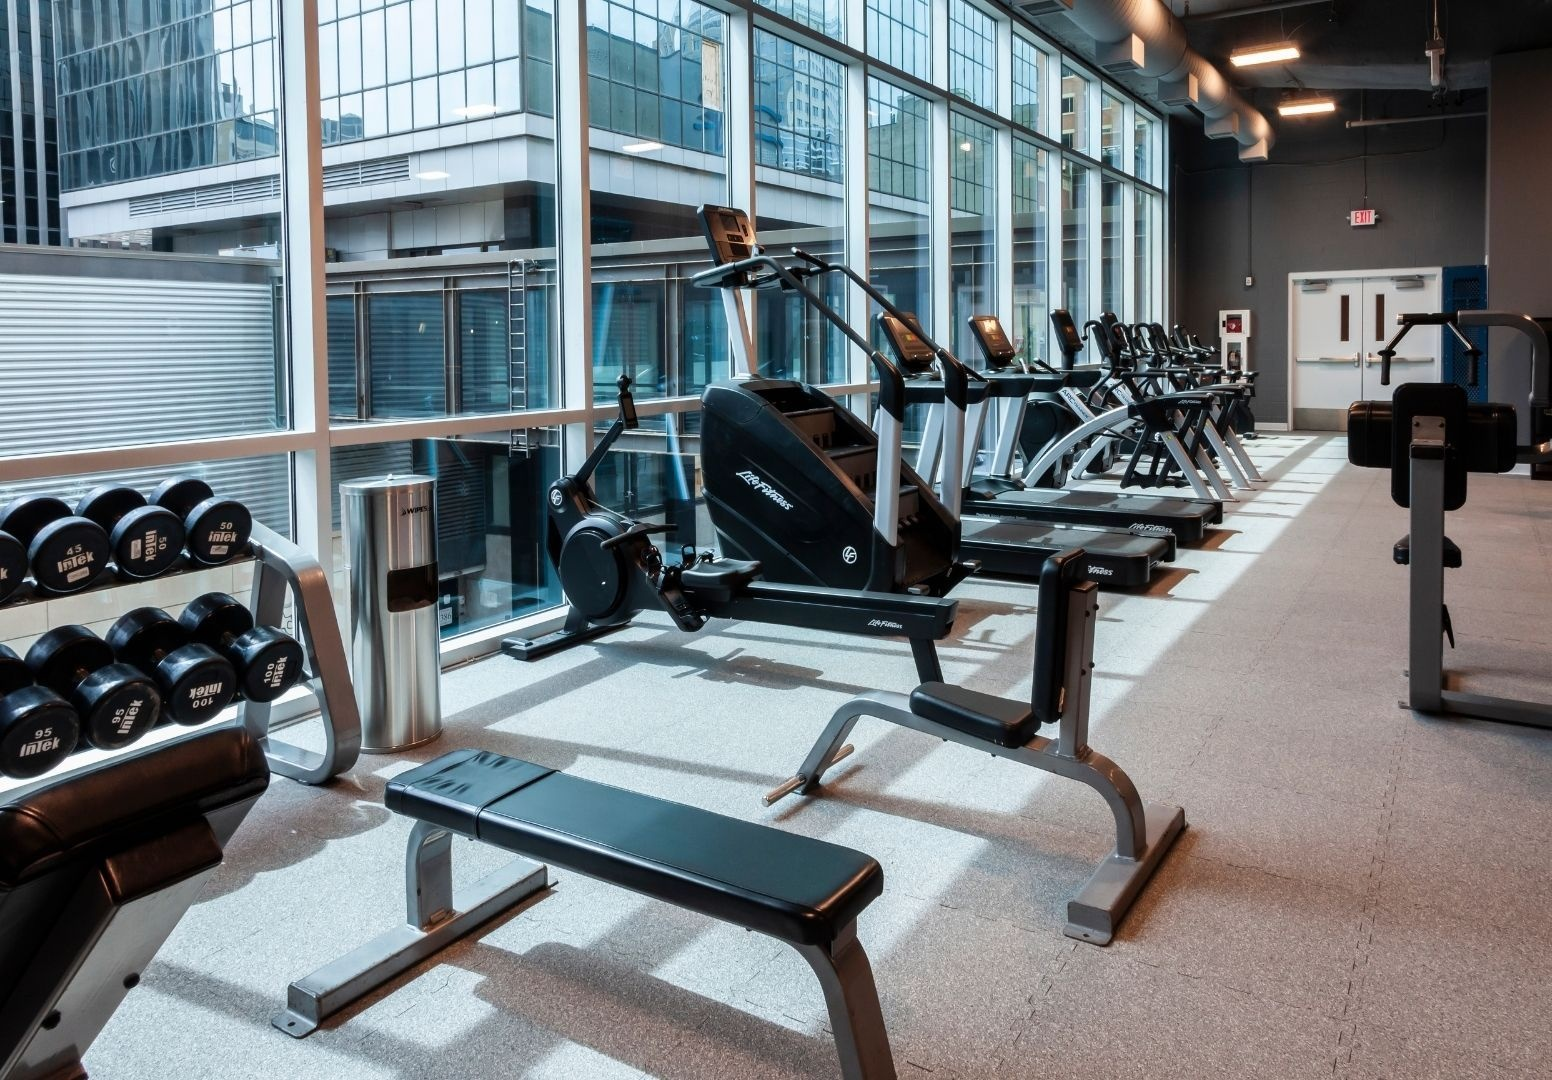 Finish Line Wellness Fitness Equipment